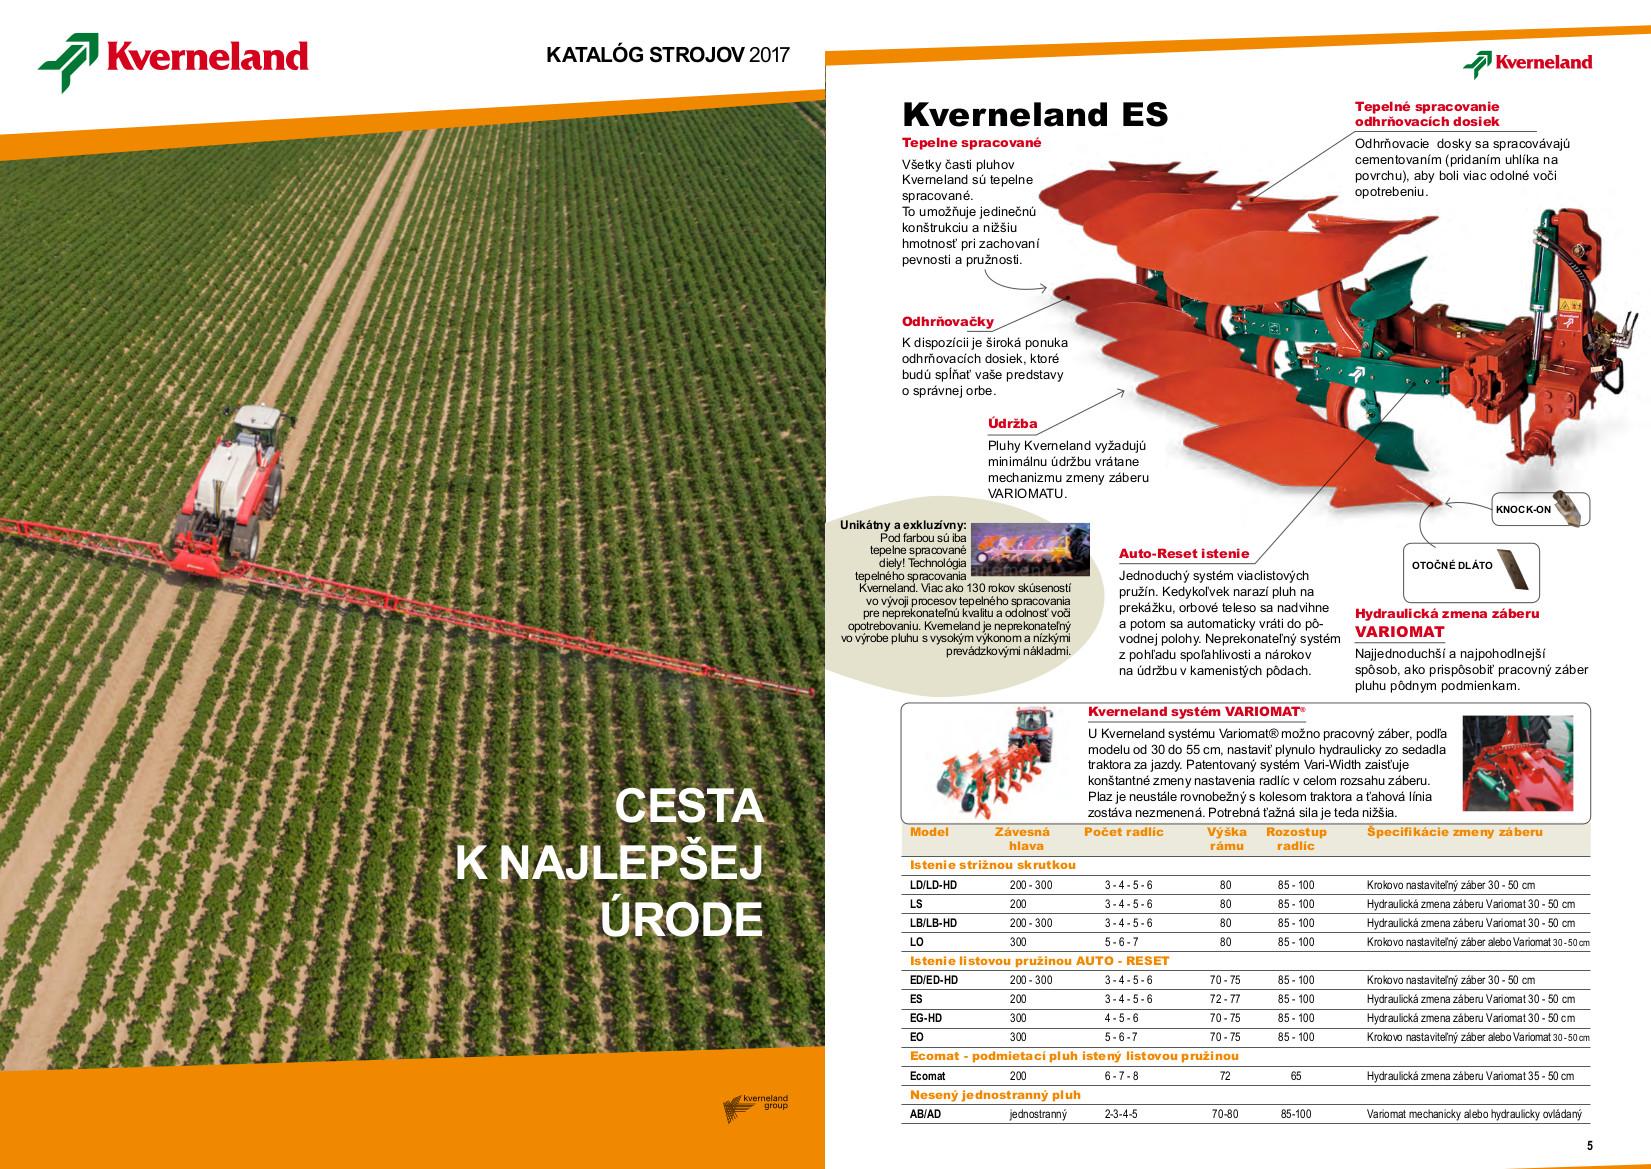 katalog produktov kverneland 2017